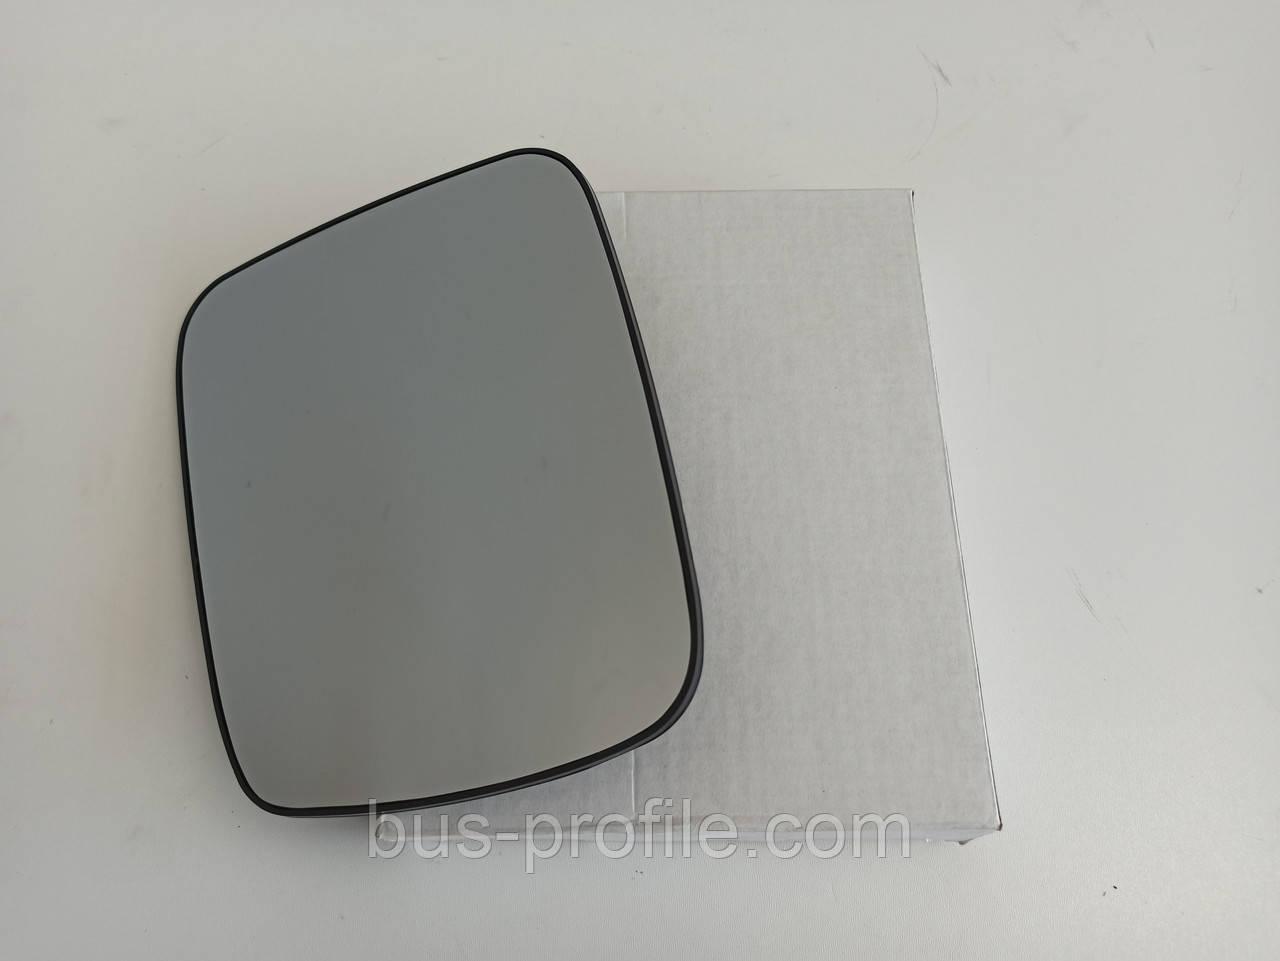 Стекло зеркала (с подогревом) VW T4 91-03 (L) — Autotechteile — 385 7001